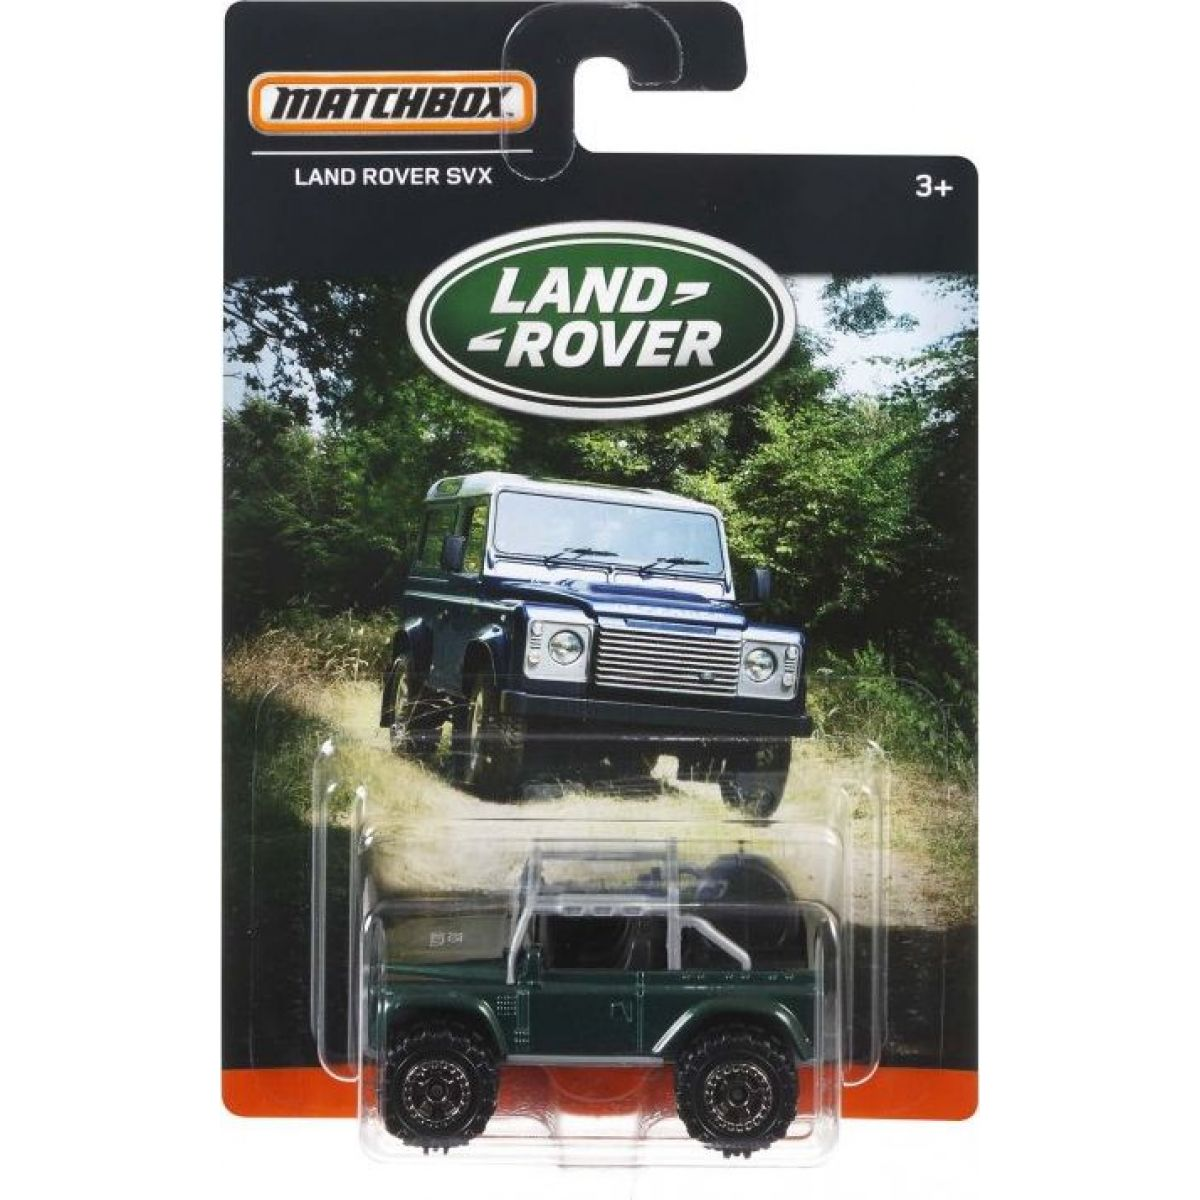 Matchbox angličák Land Rover SVX